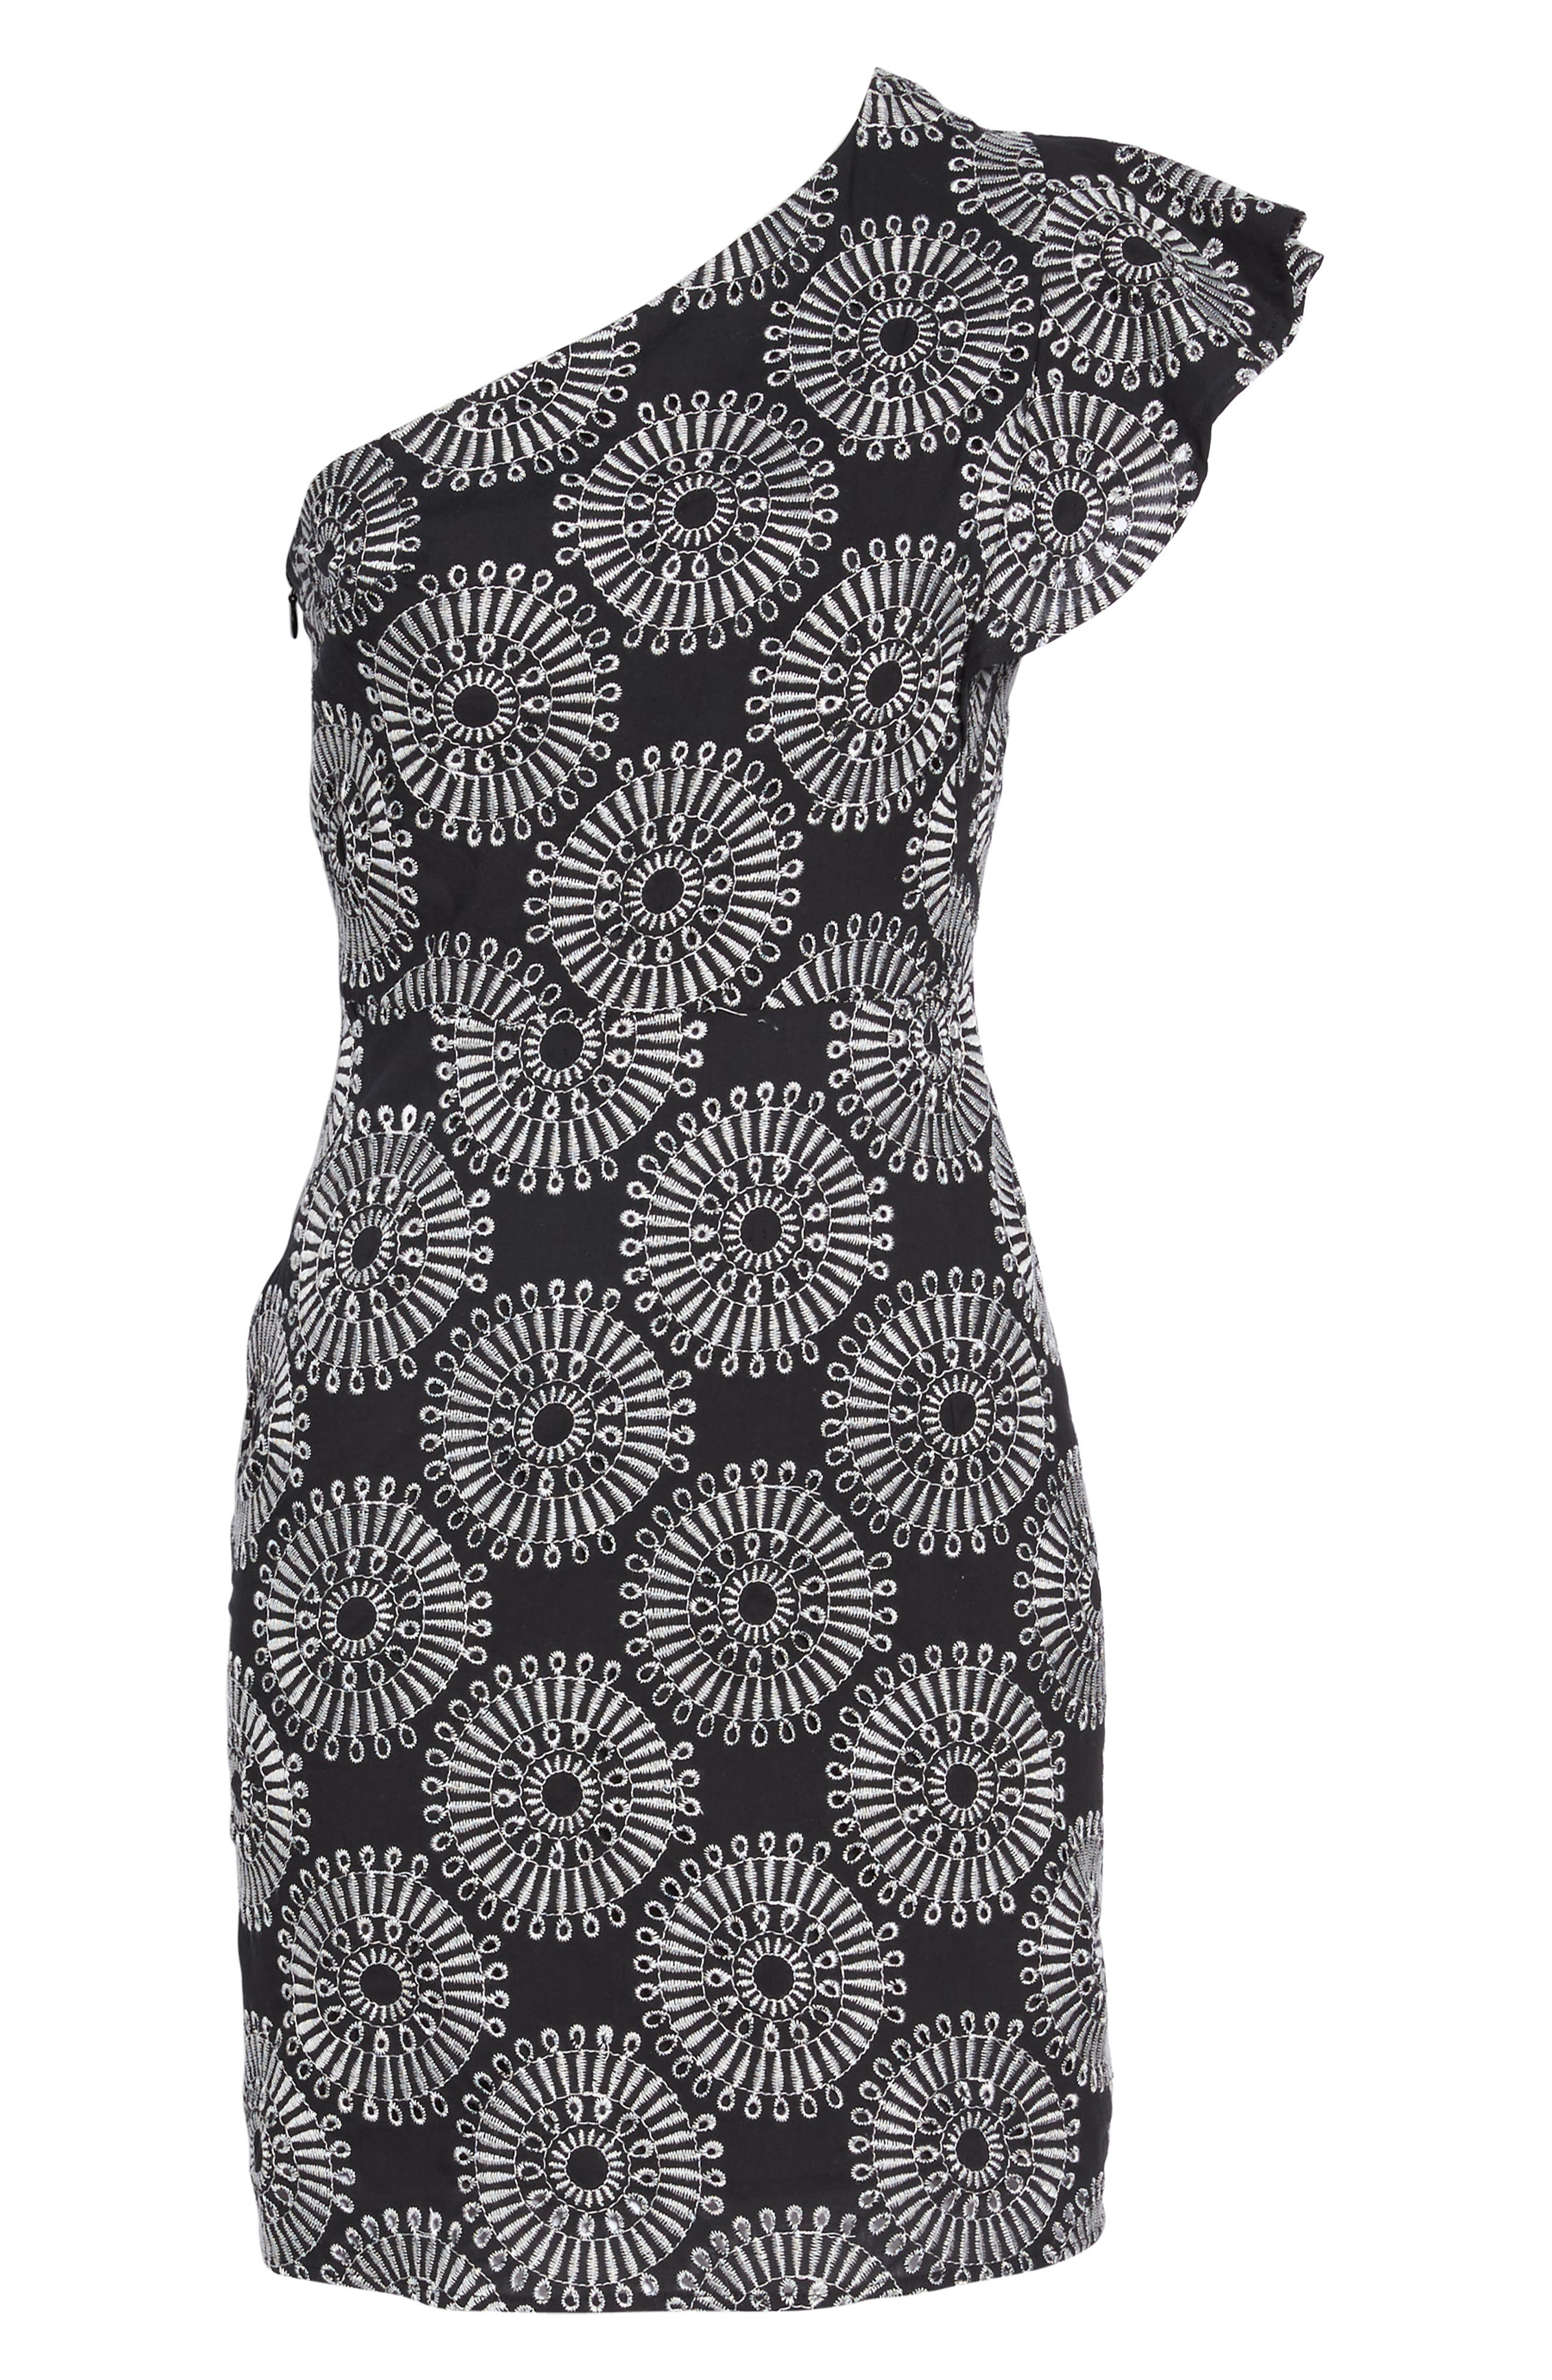 Embroidered One-Shoulder Sheath Dress,                             Alternate thumbnail 6, color,                             Black/ White